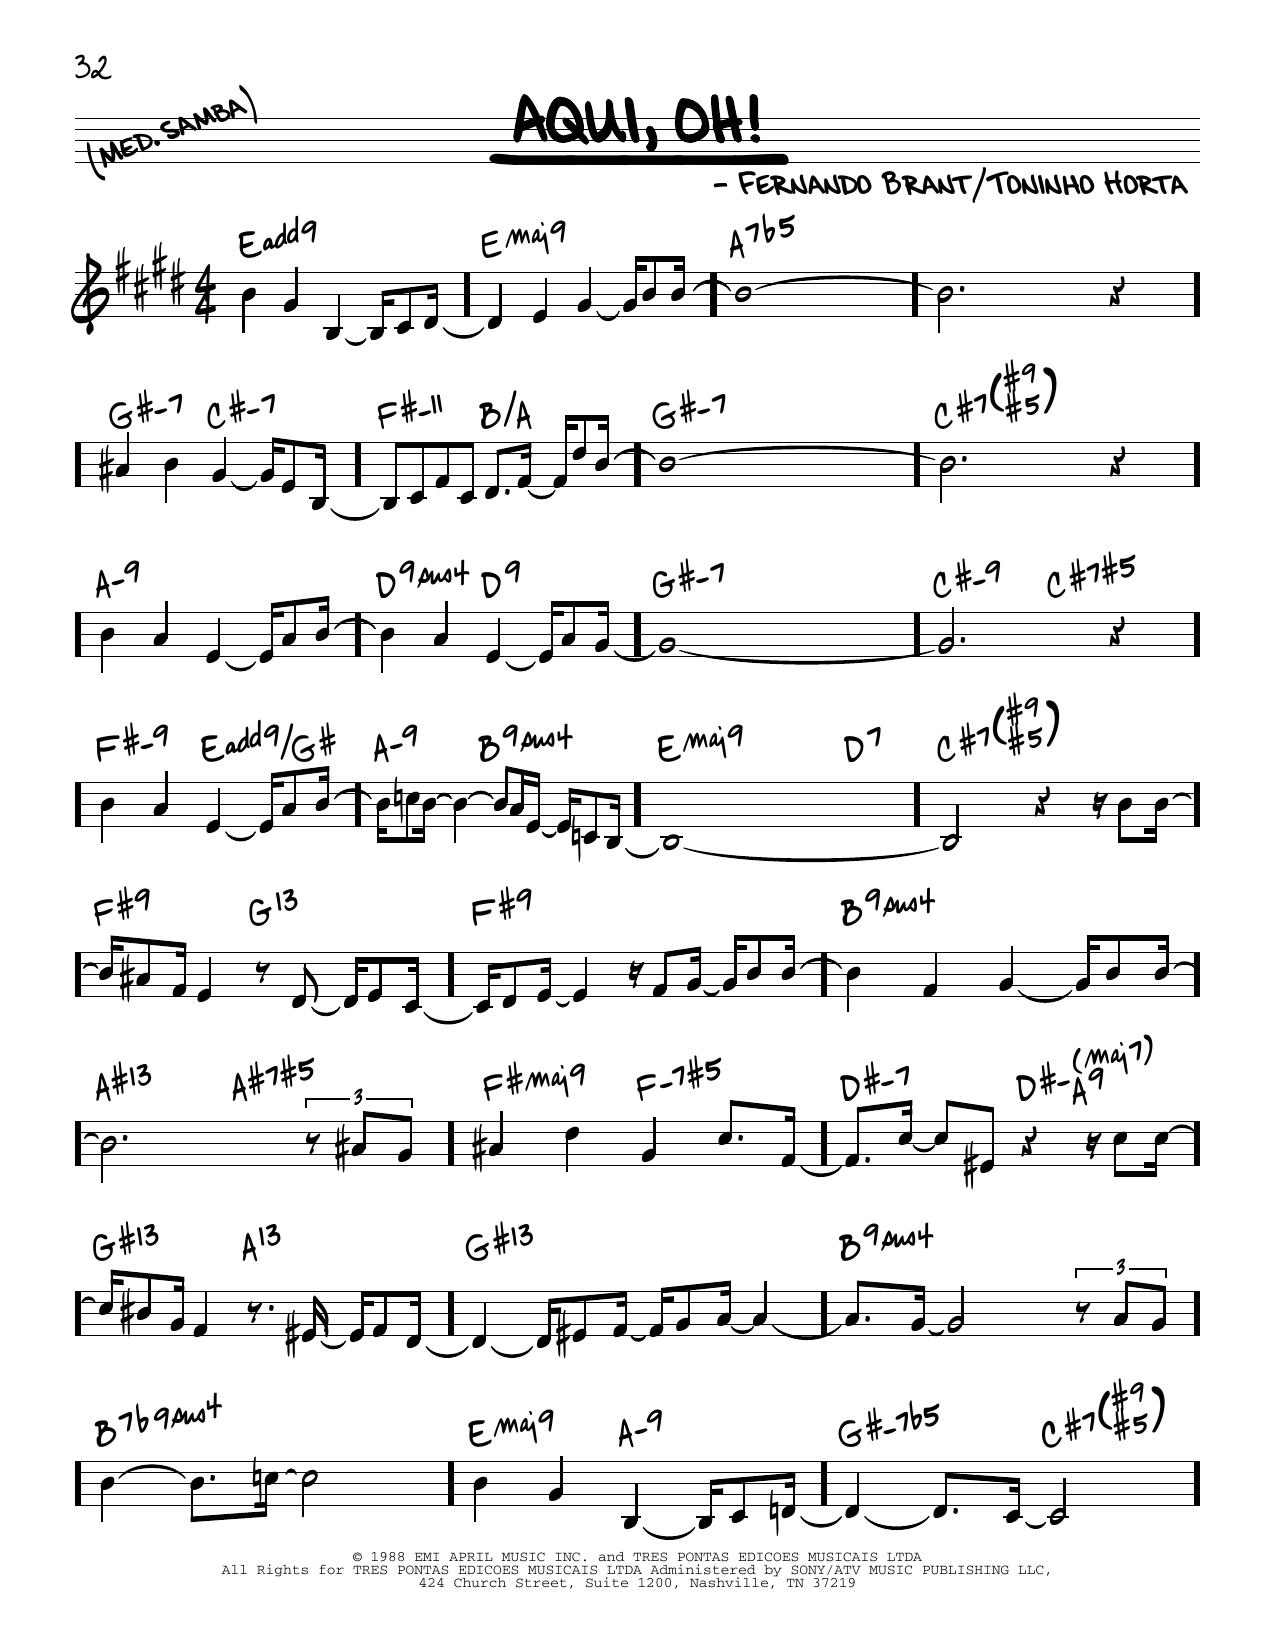 Toninho Horta Aqui, Oh! sheet music notes and chords. Download Printable PDF.